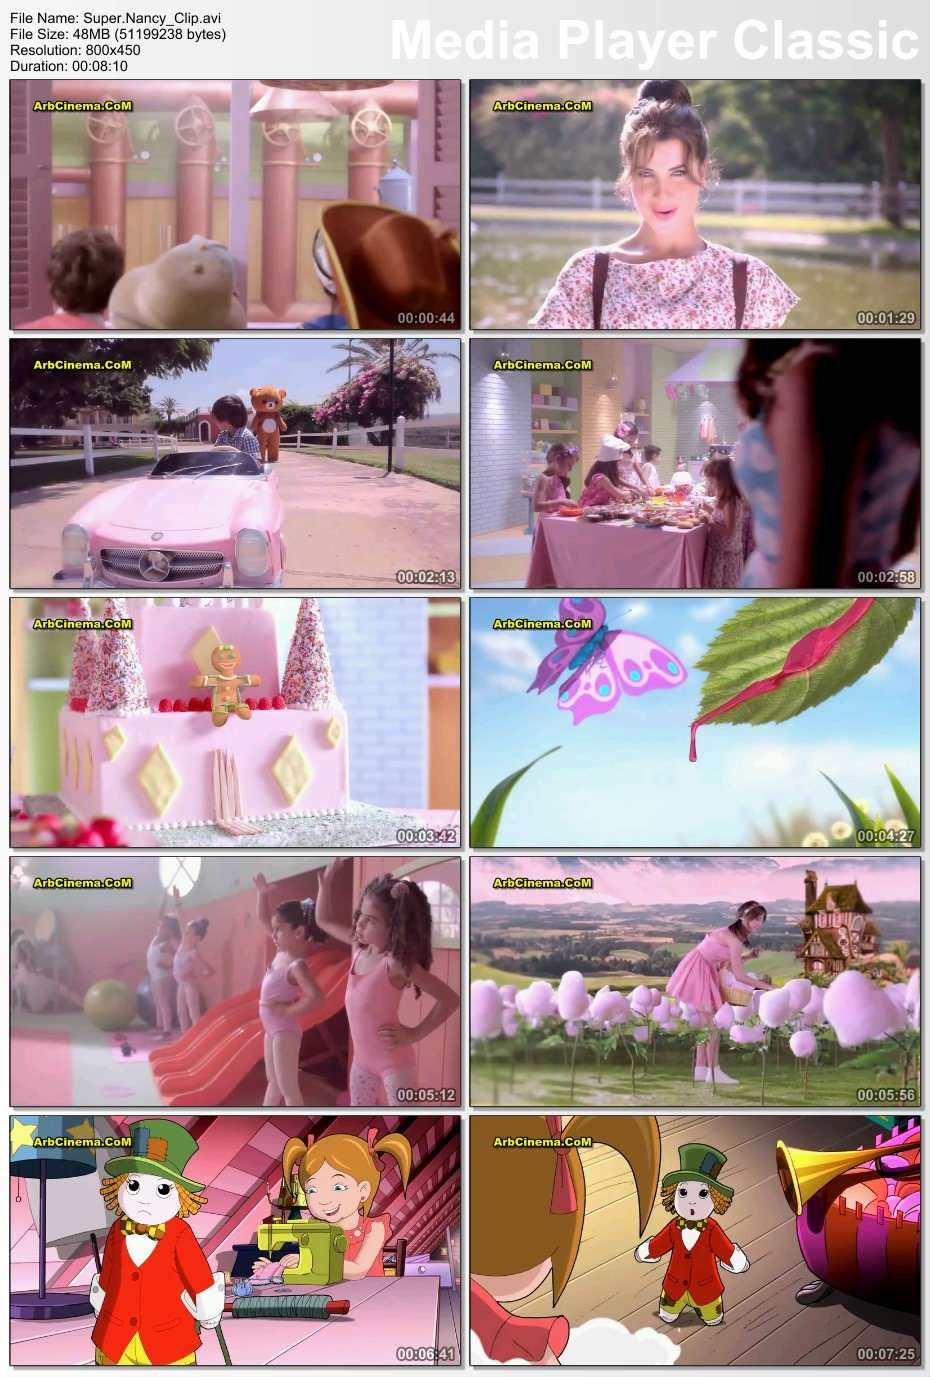 X264 Nancy Ajram Super Nancy thumb100.jpg